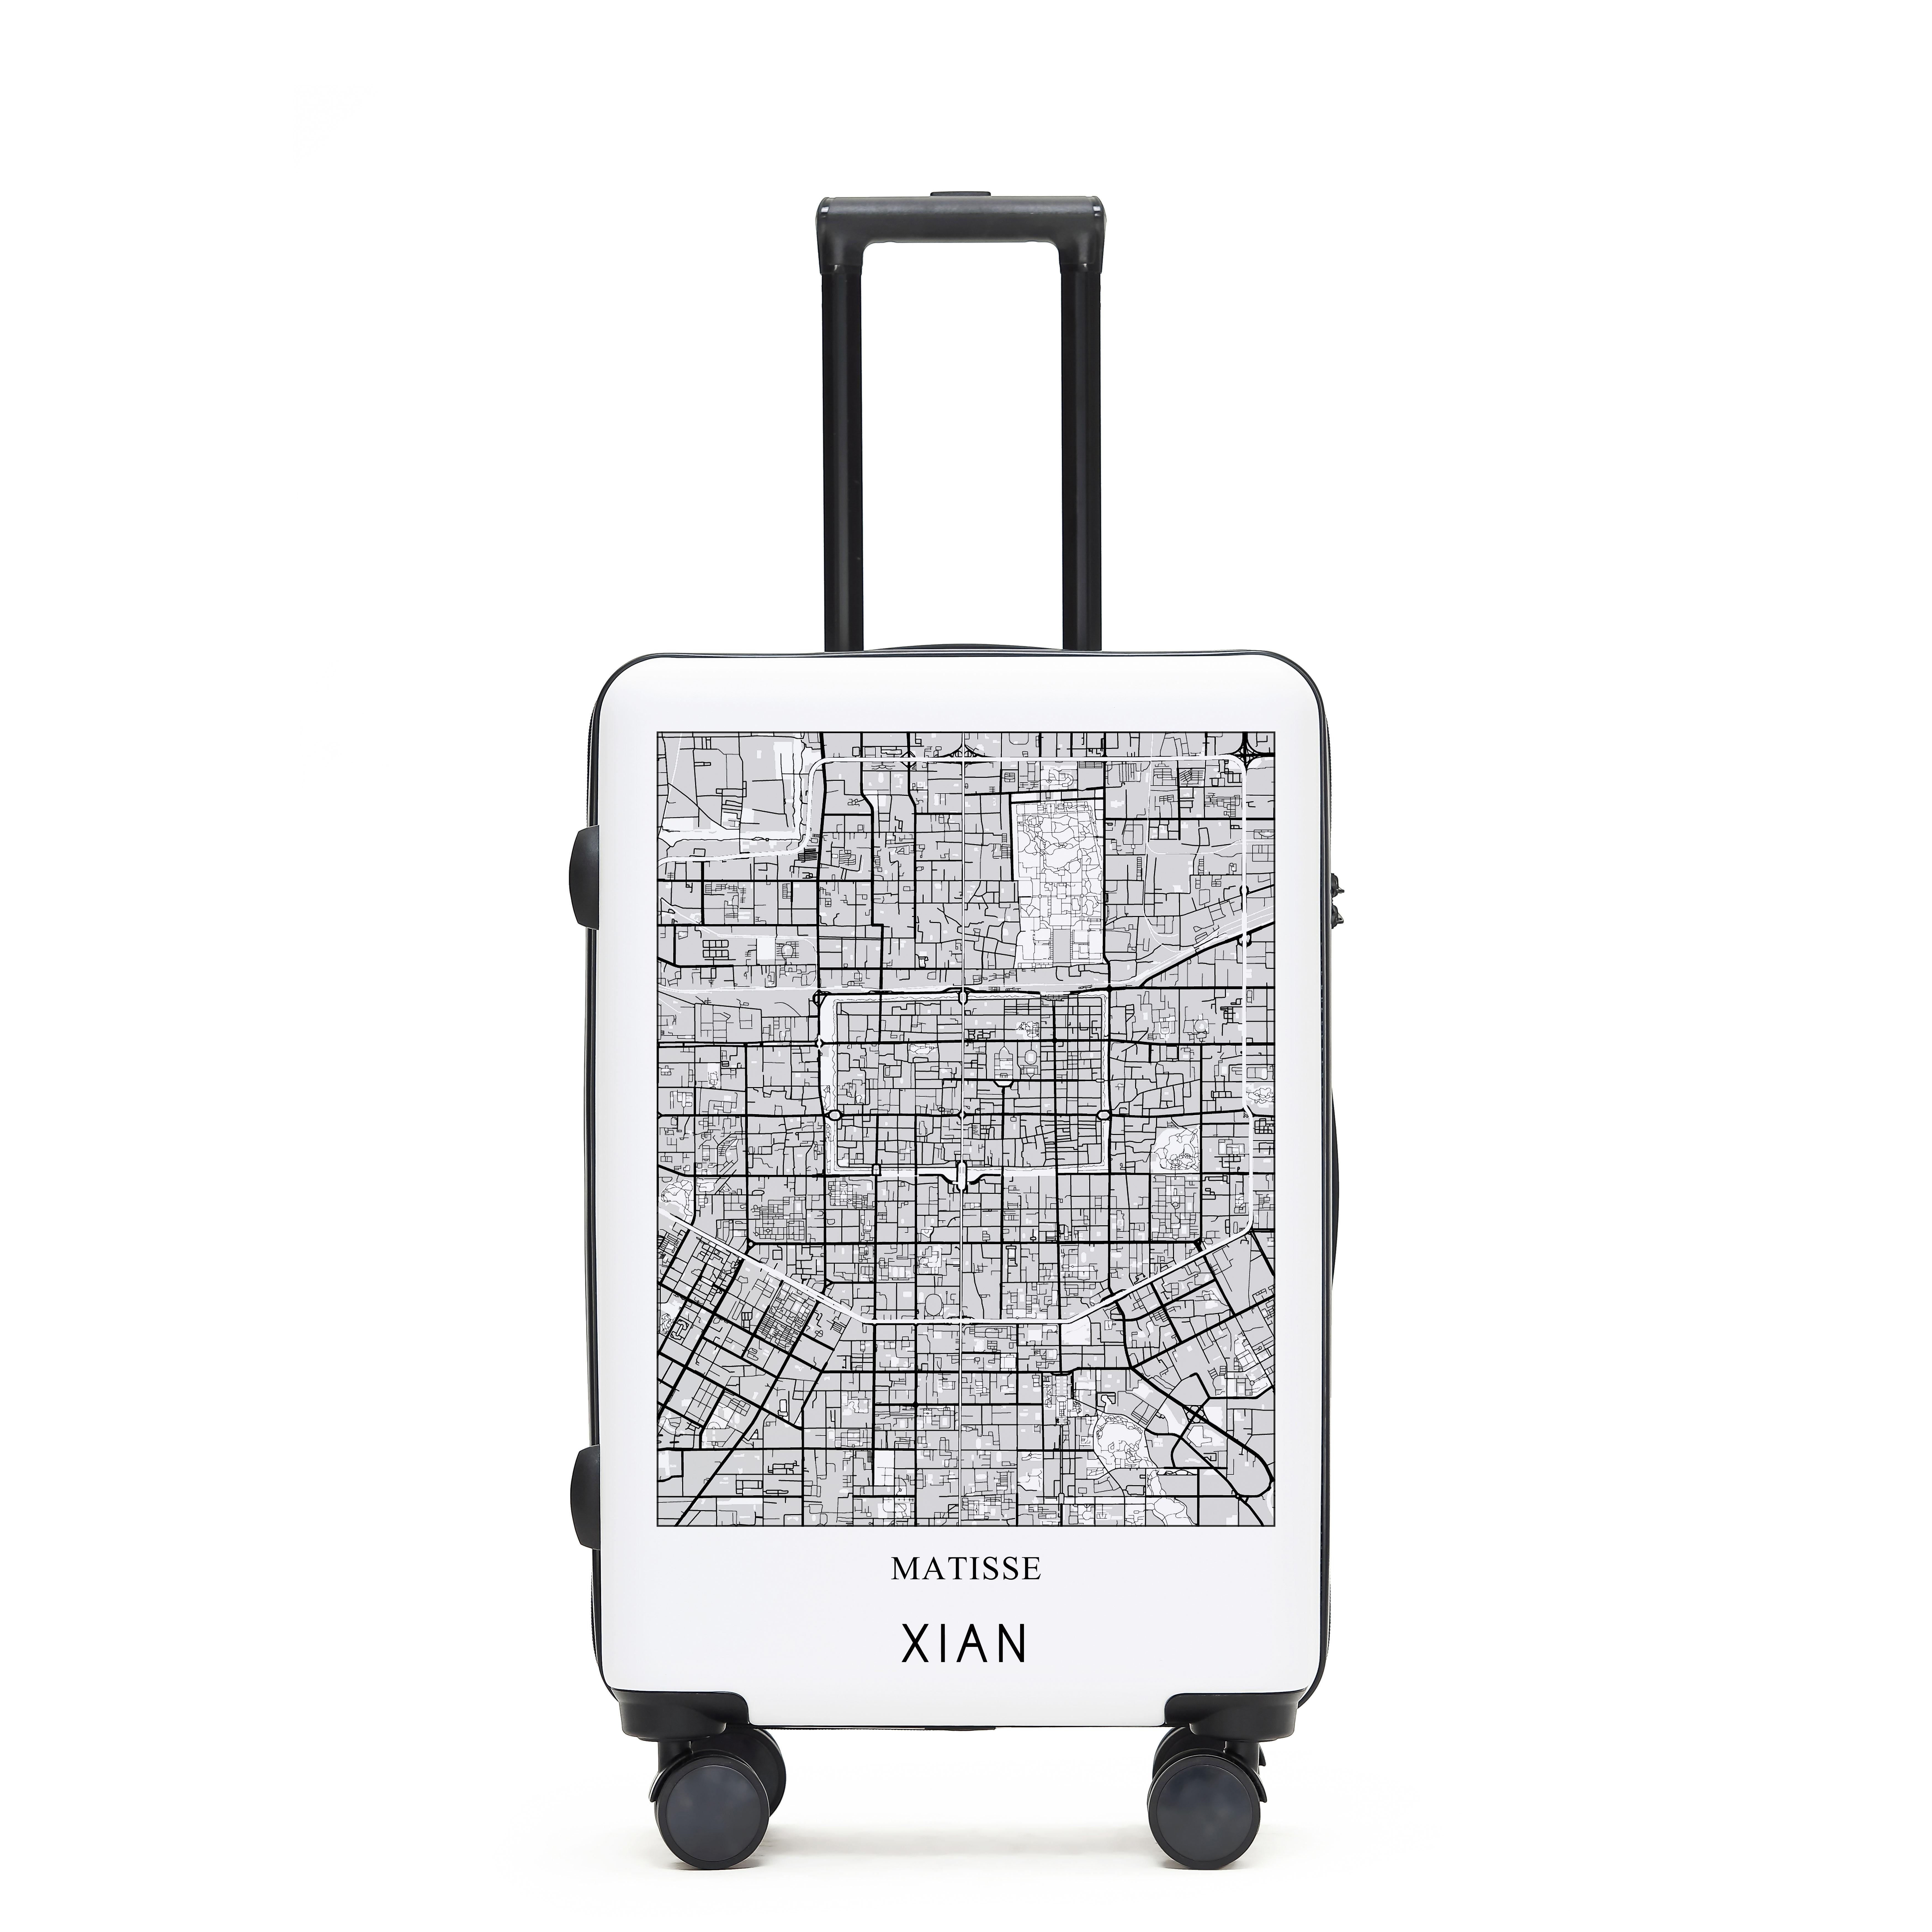 Matisse城市地图拉杆箱 旅行箱行李箱20寸24寸网红箱